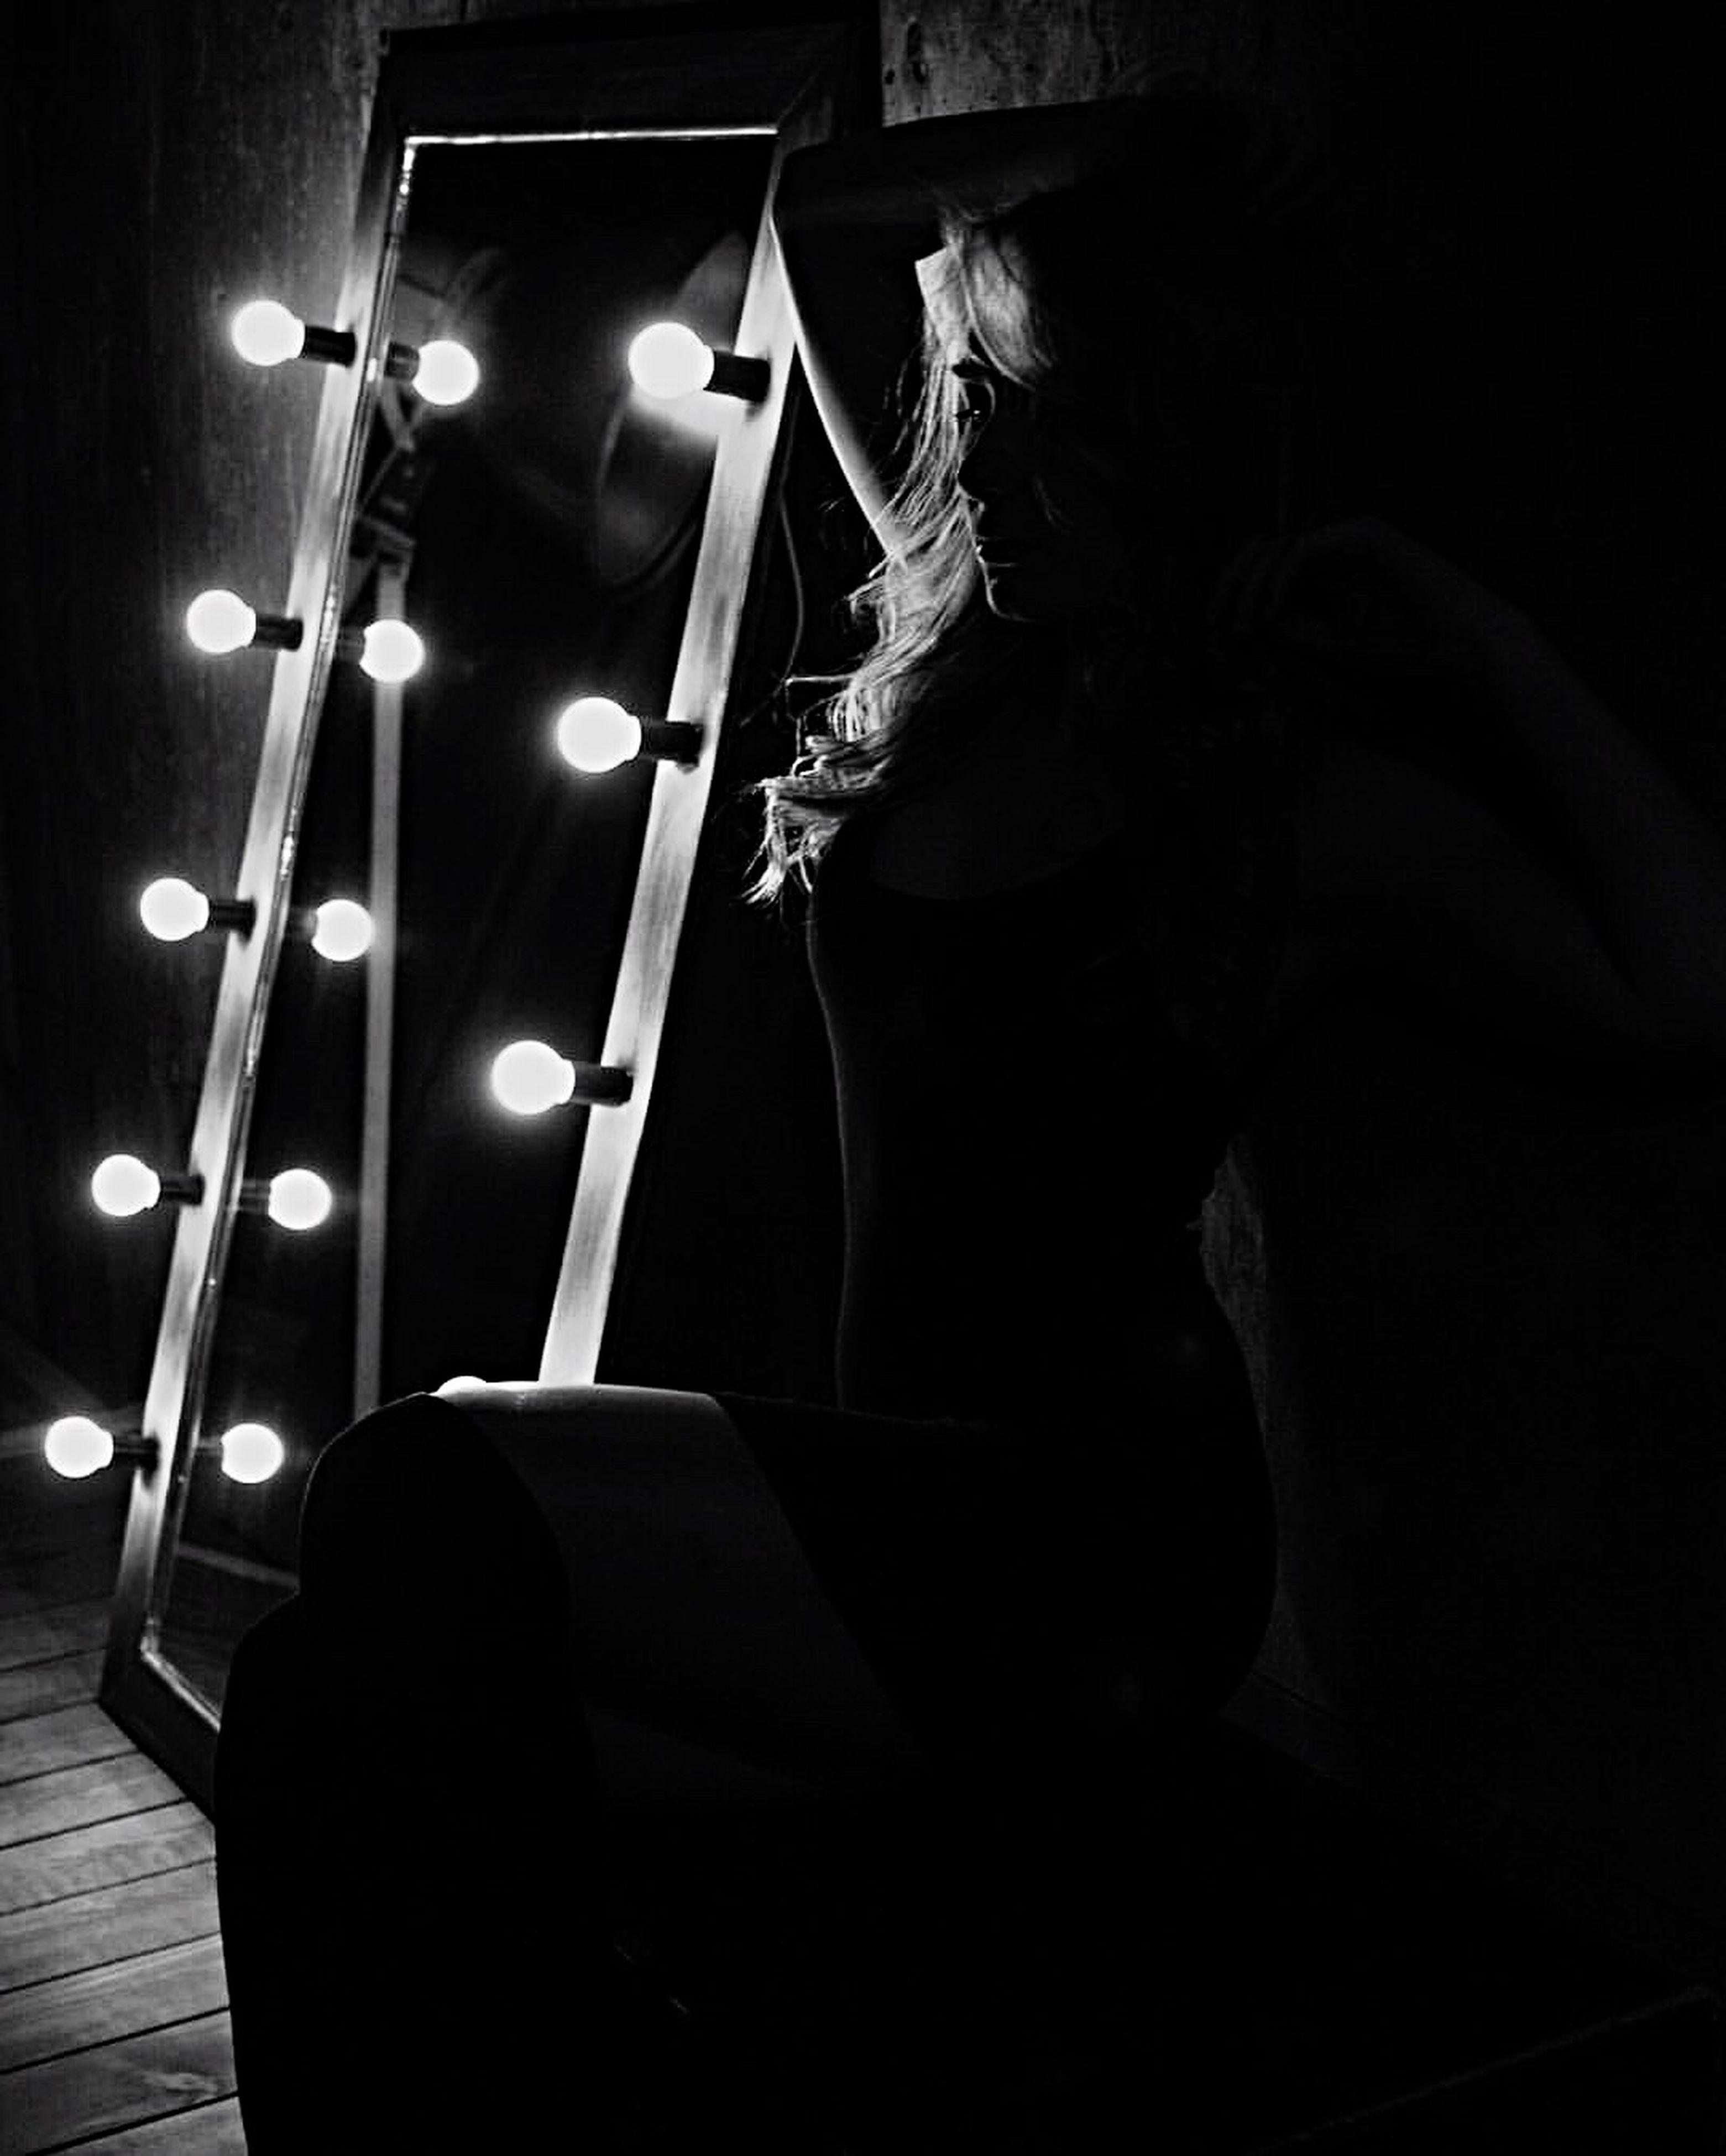 lighting equipment, illuminated, indoors, night, one person, dark, real people, black background, people